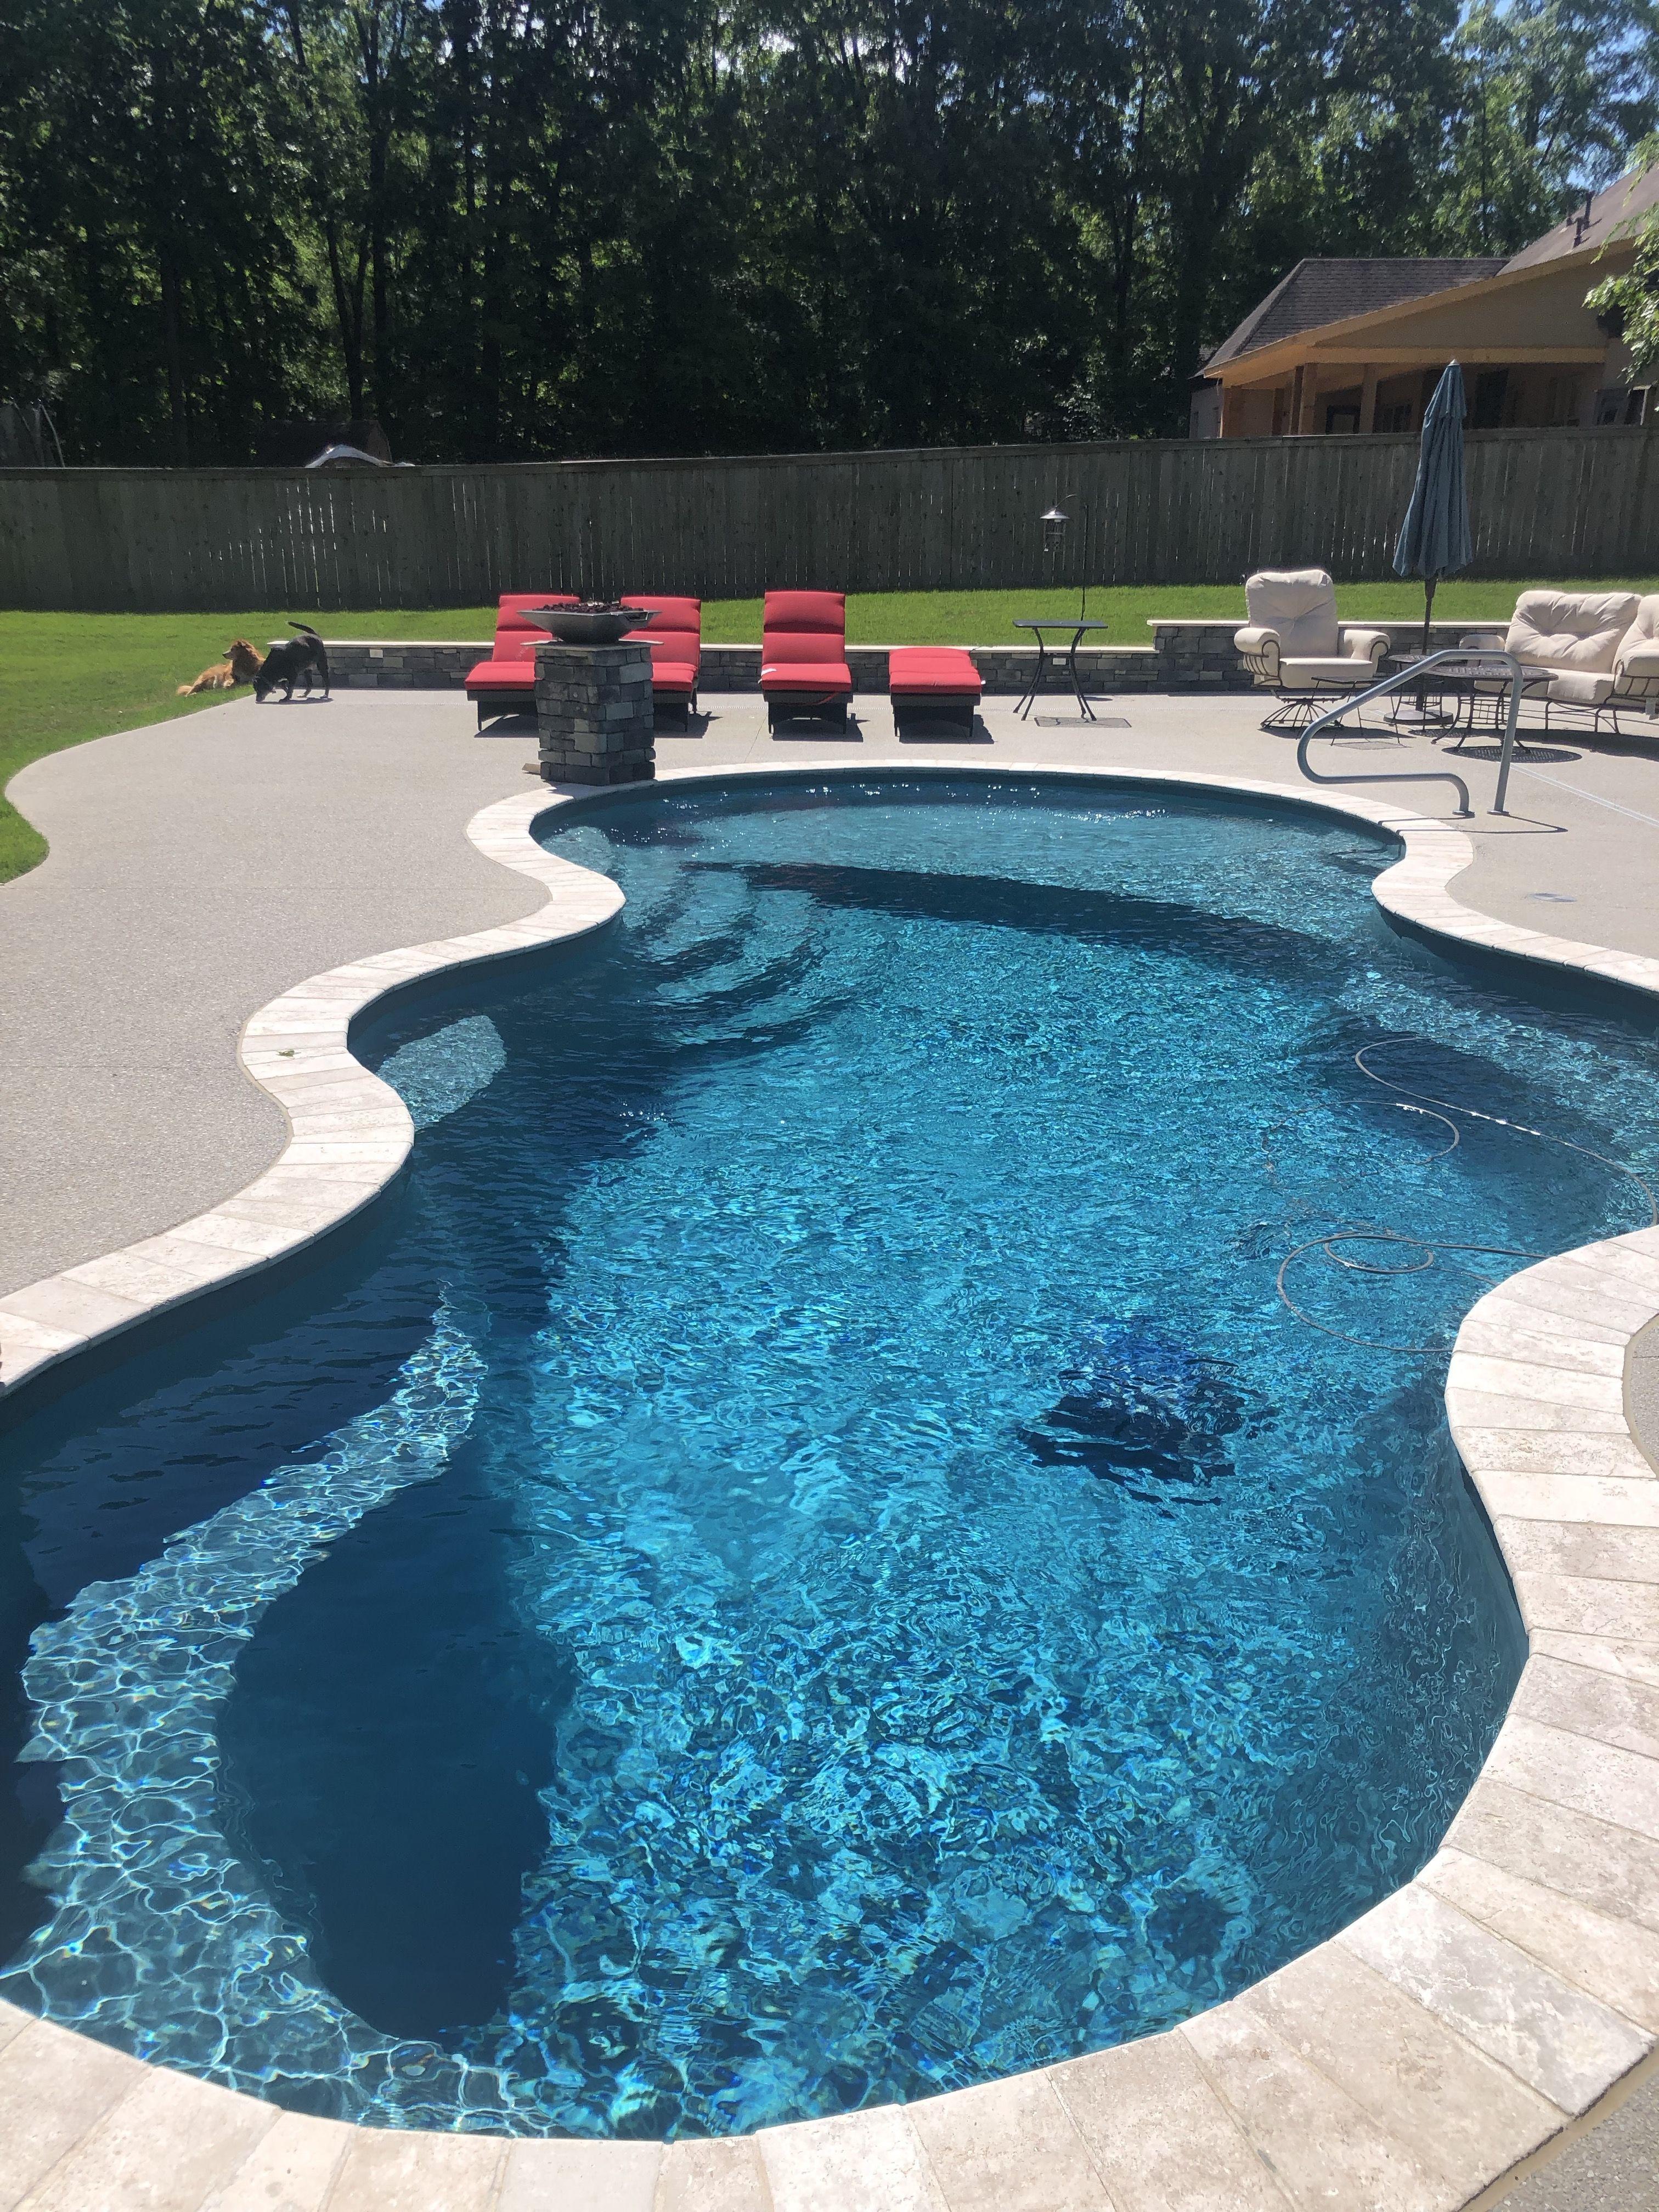 Trilogy Axiom Fiberglass Salt Water Pool Outdoor Oasistrilogy Axiom Fiberglass Salt Water Pool Dream Pool Bubbler In 2020 Pools Backyard Inground Saltwater Pool Pool